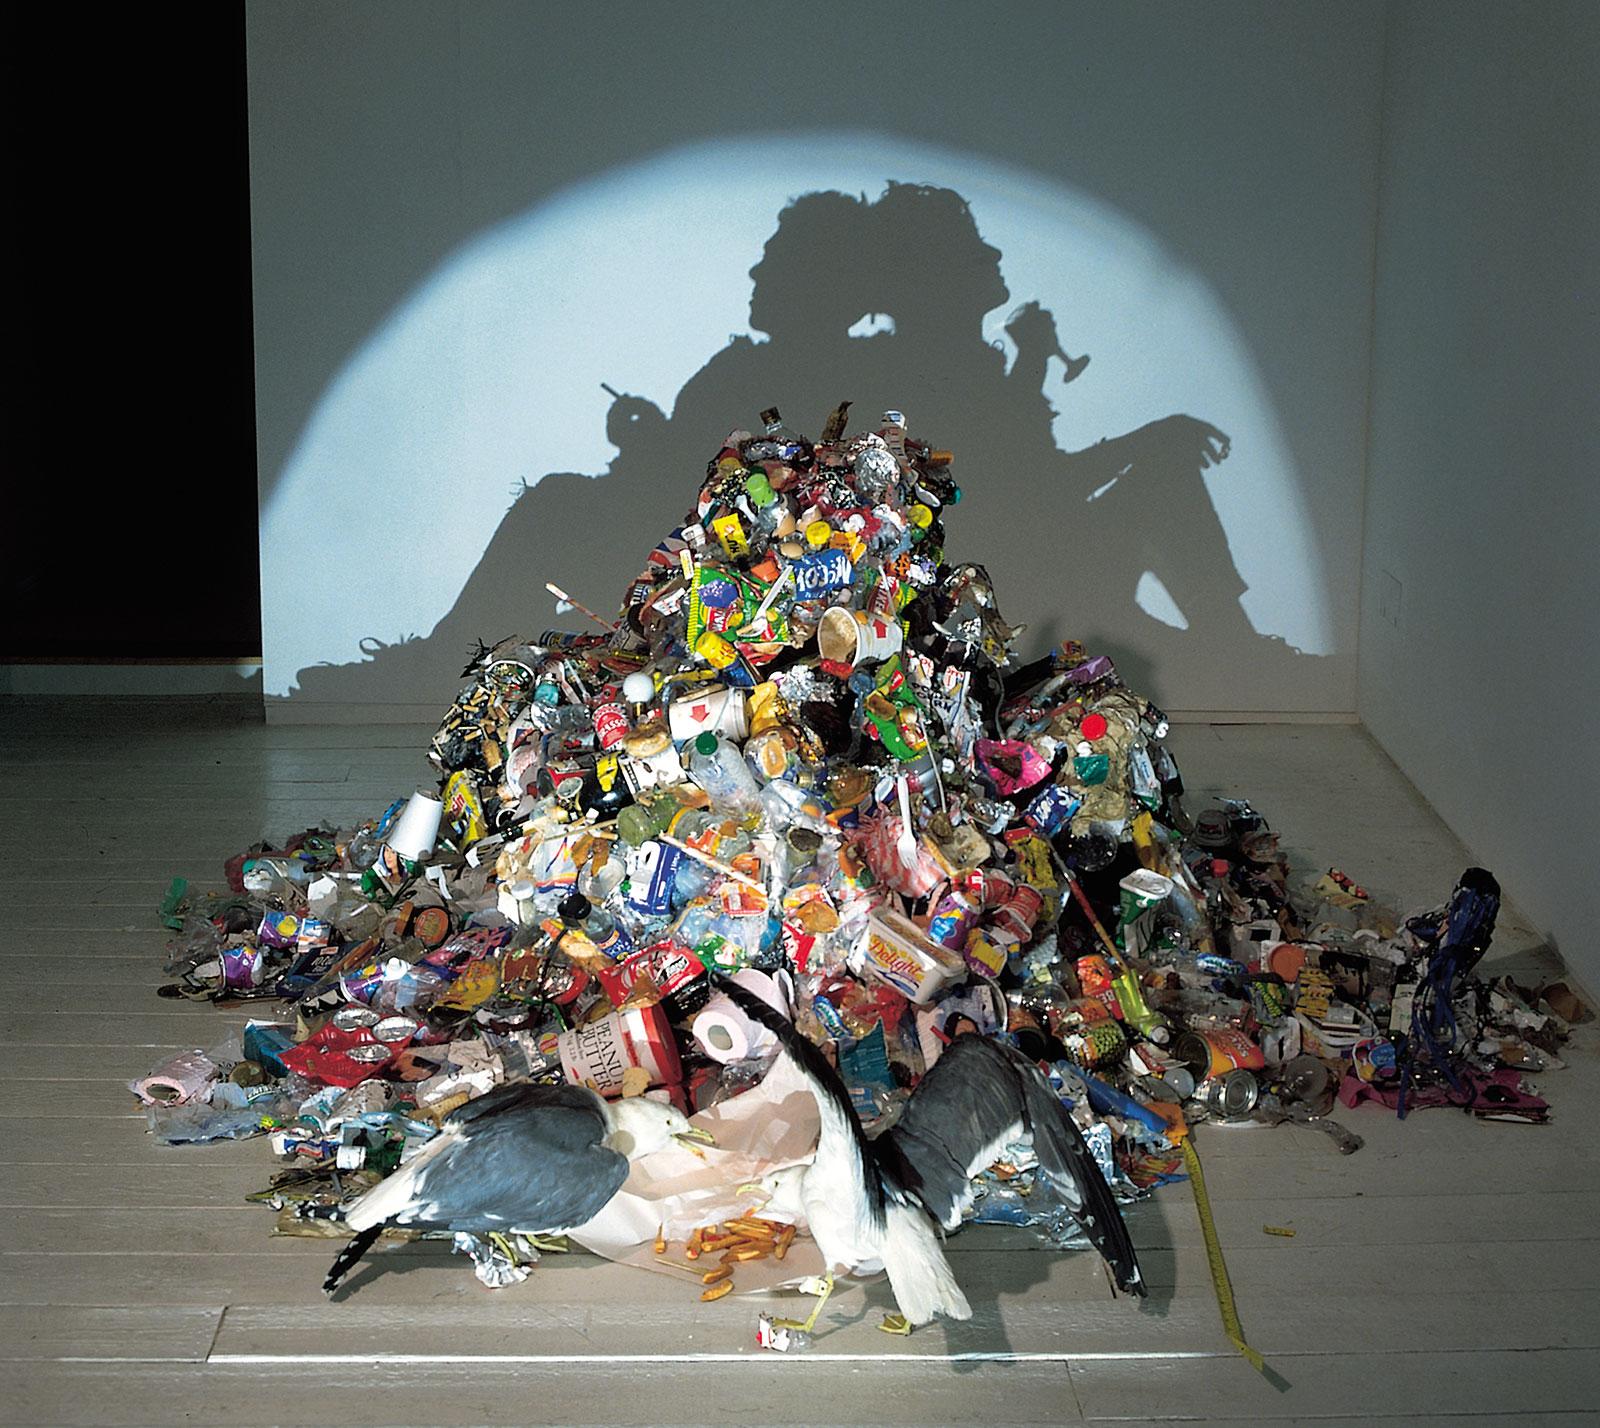 figurative shadow art from trash